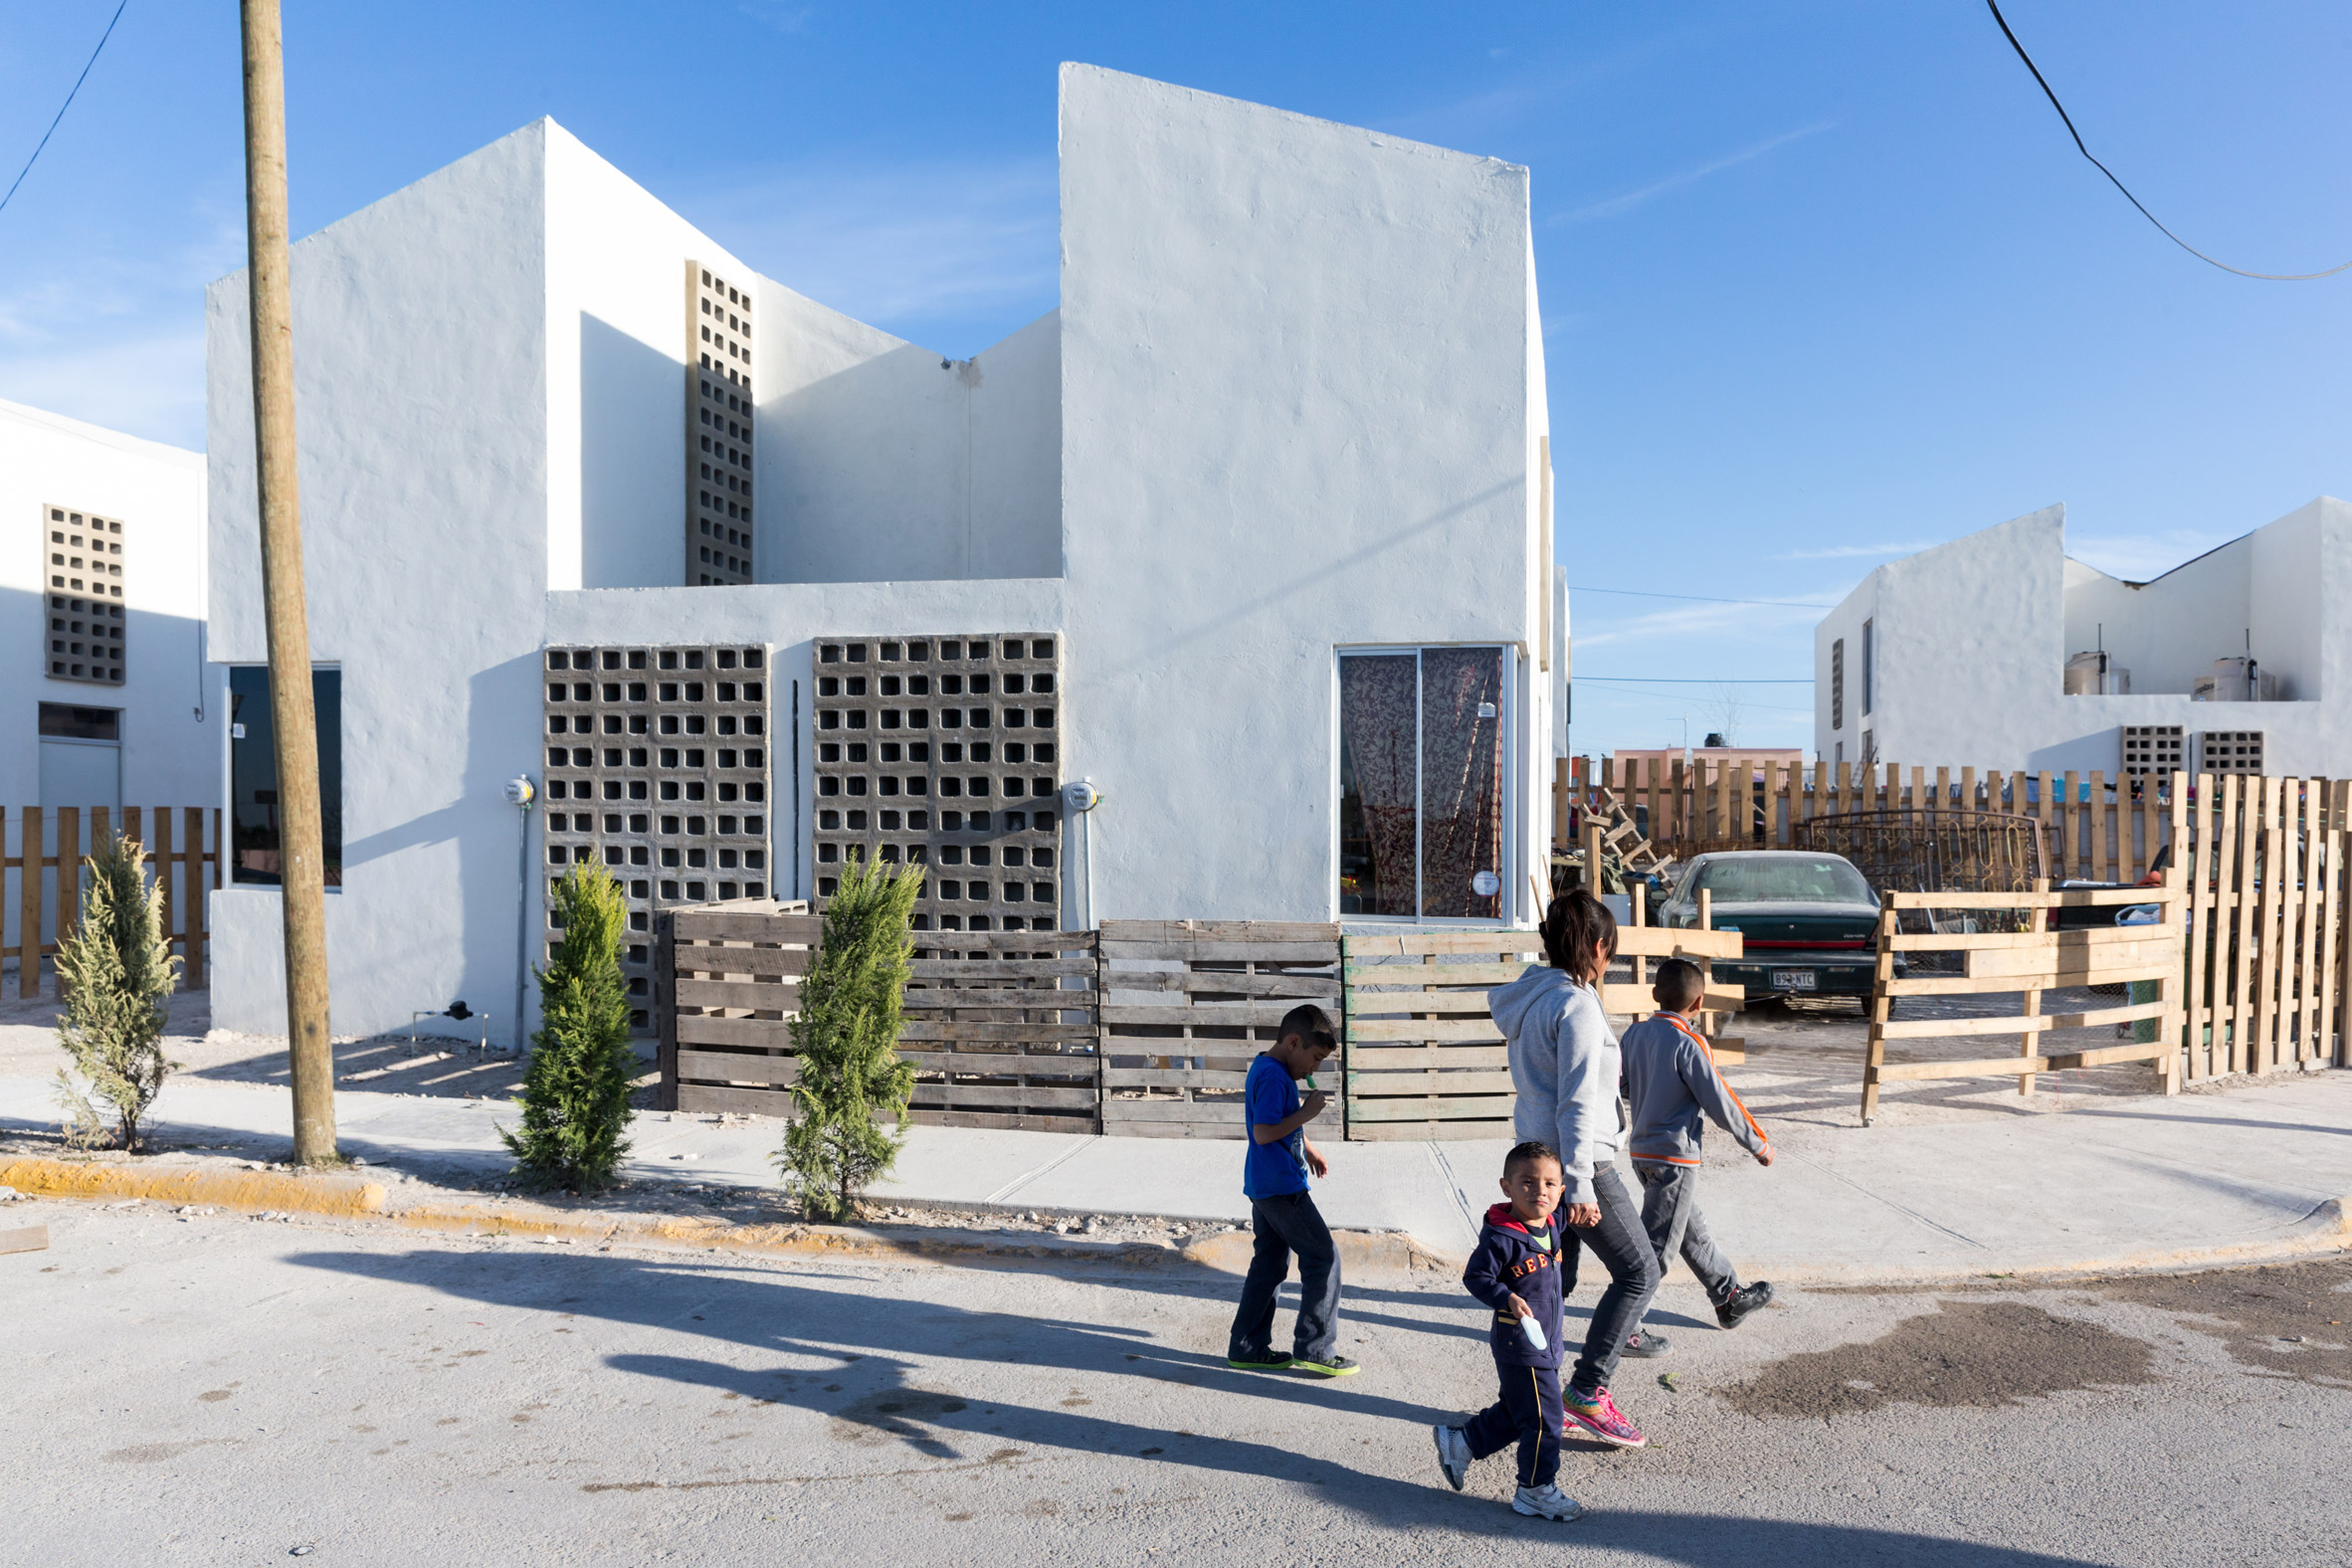 Acuña Housing by Tatiana Bilbao Estudio